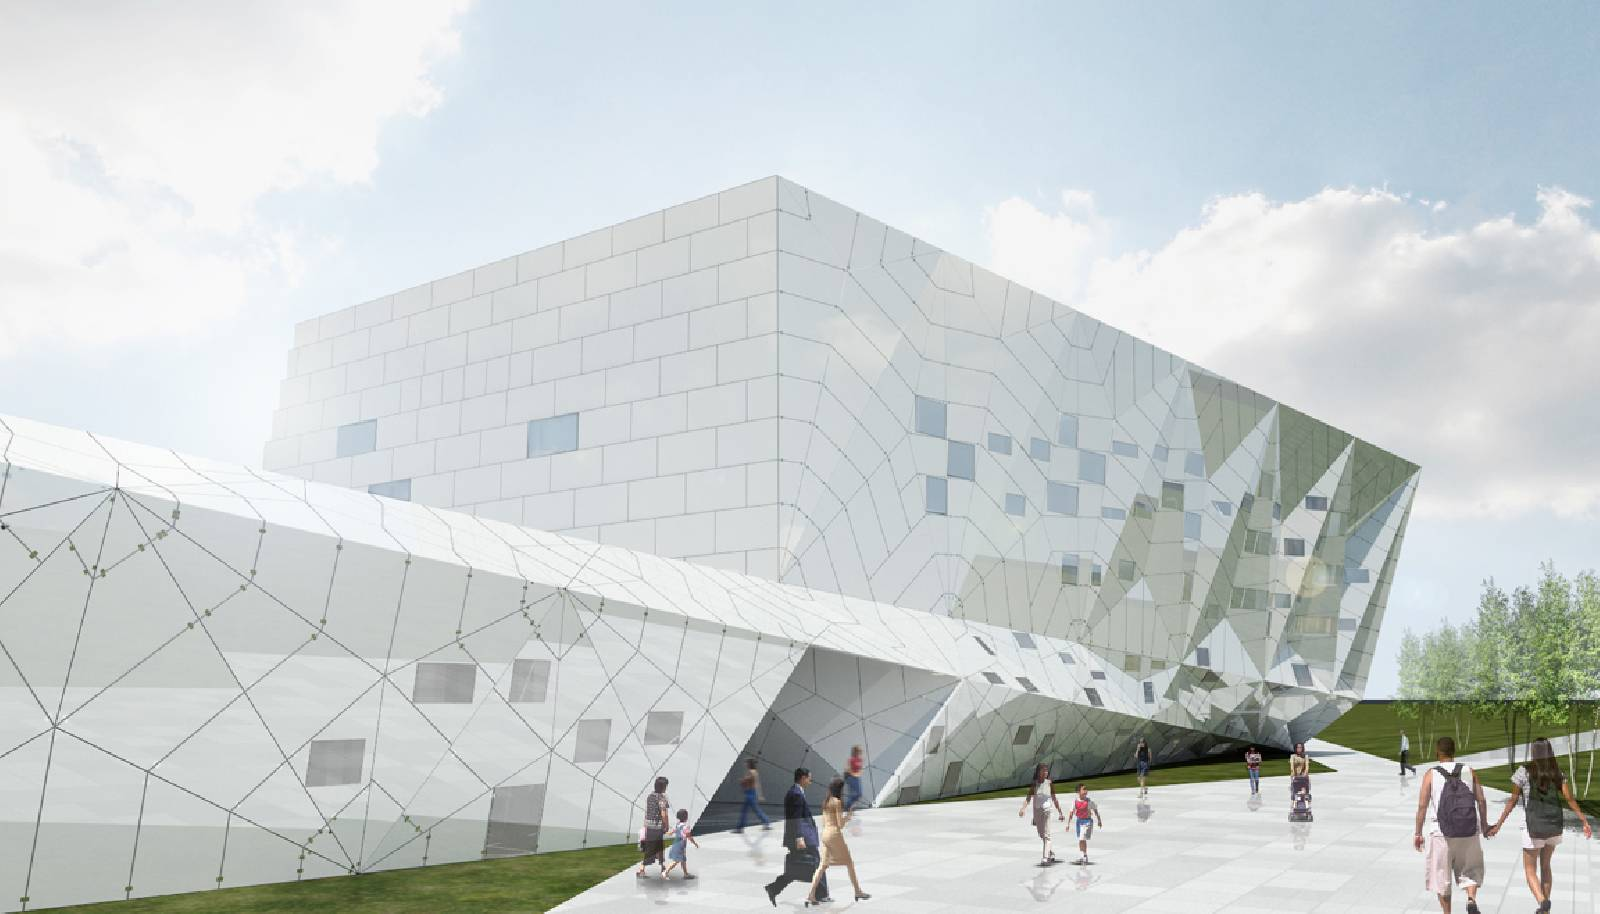 Parametric building viewing gallery